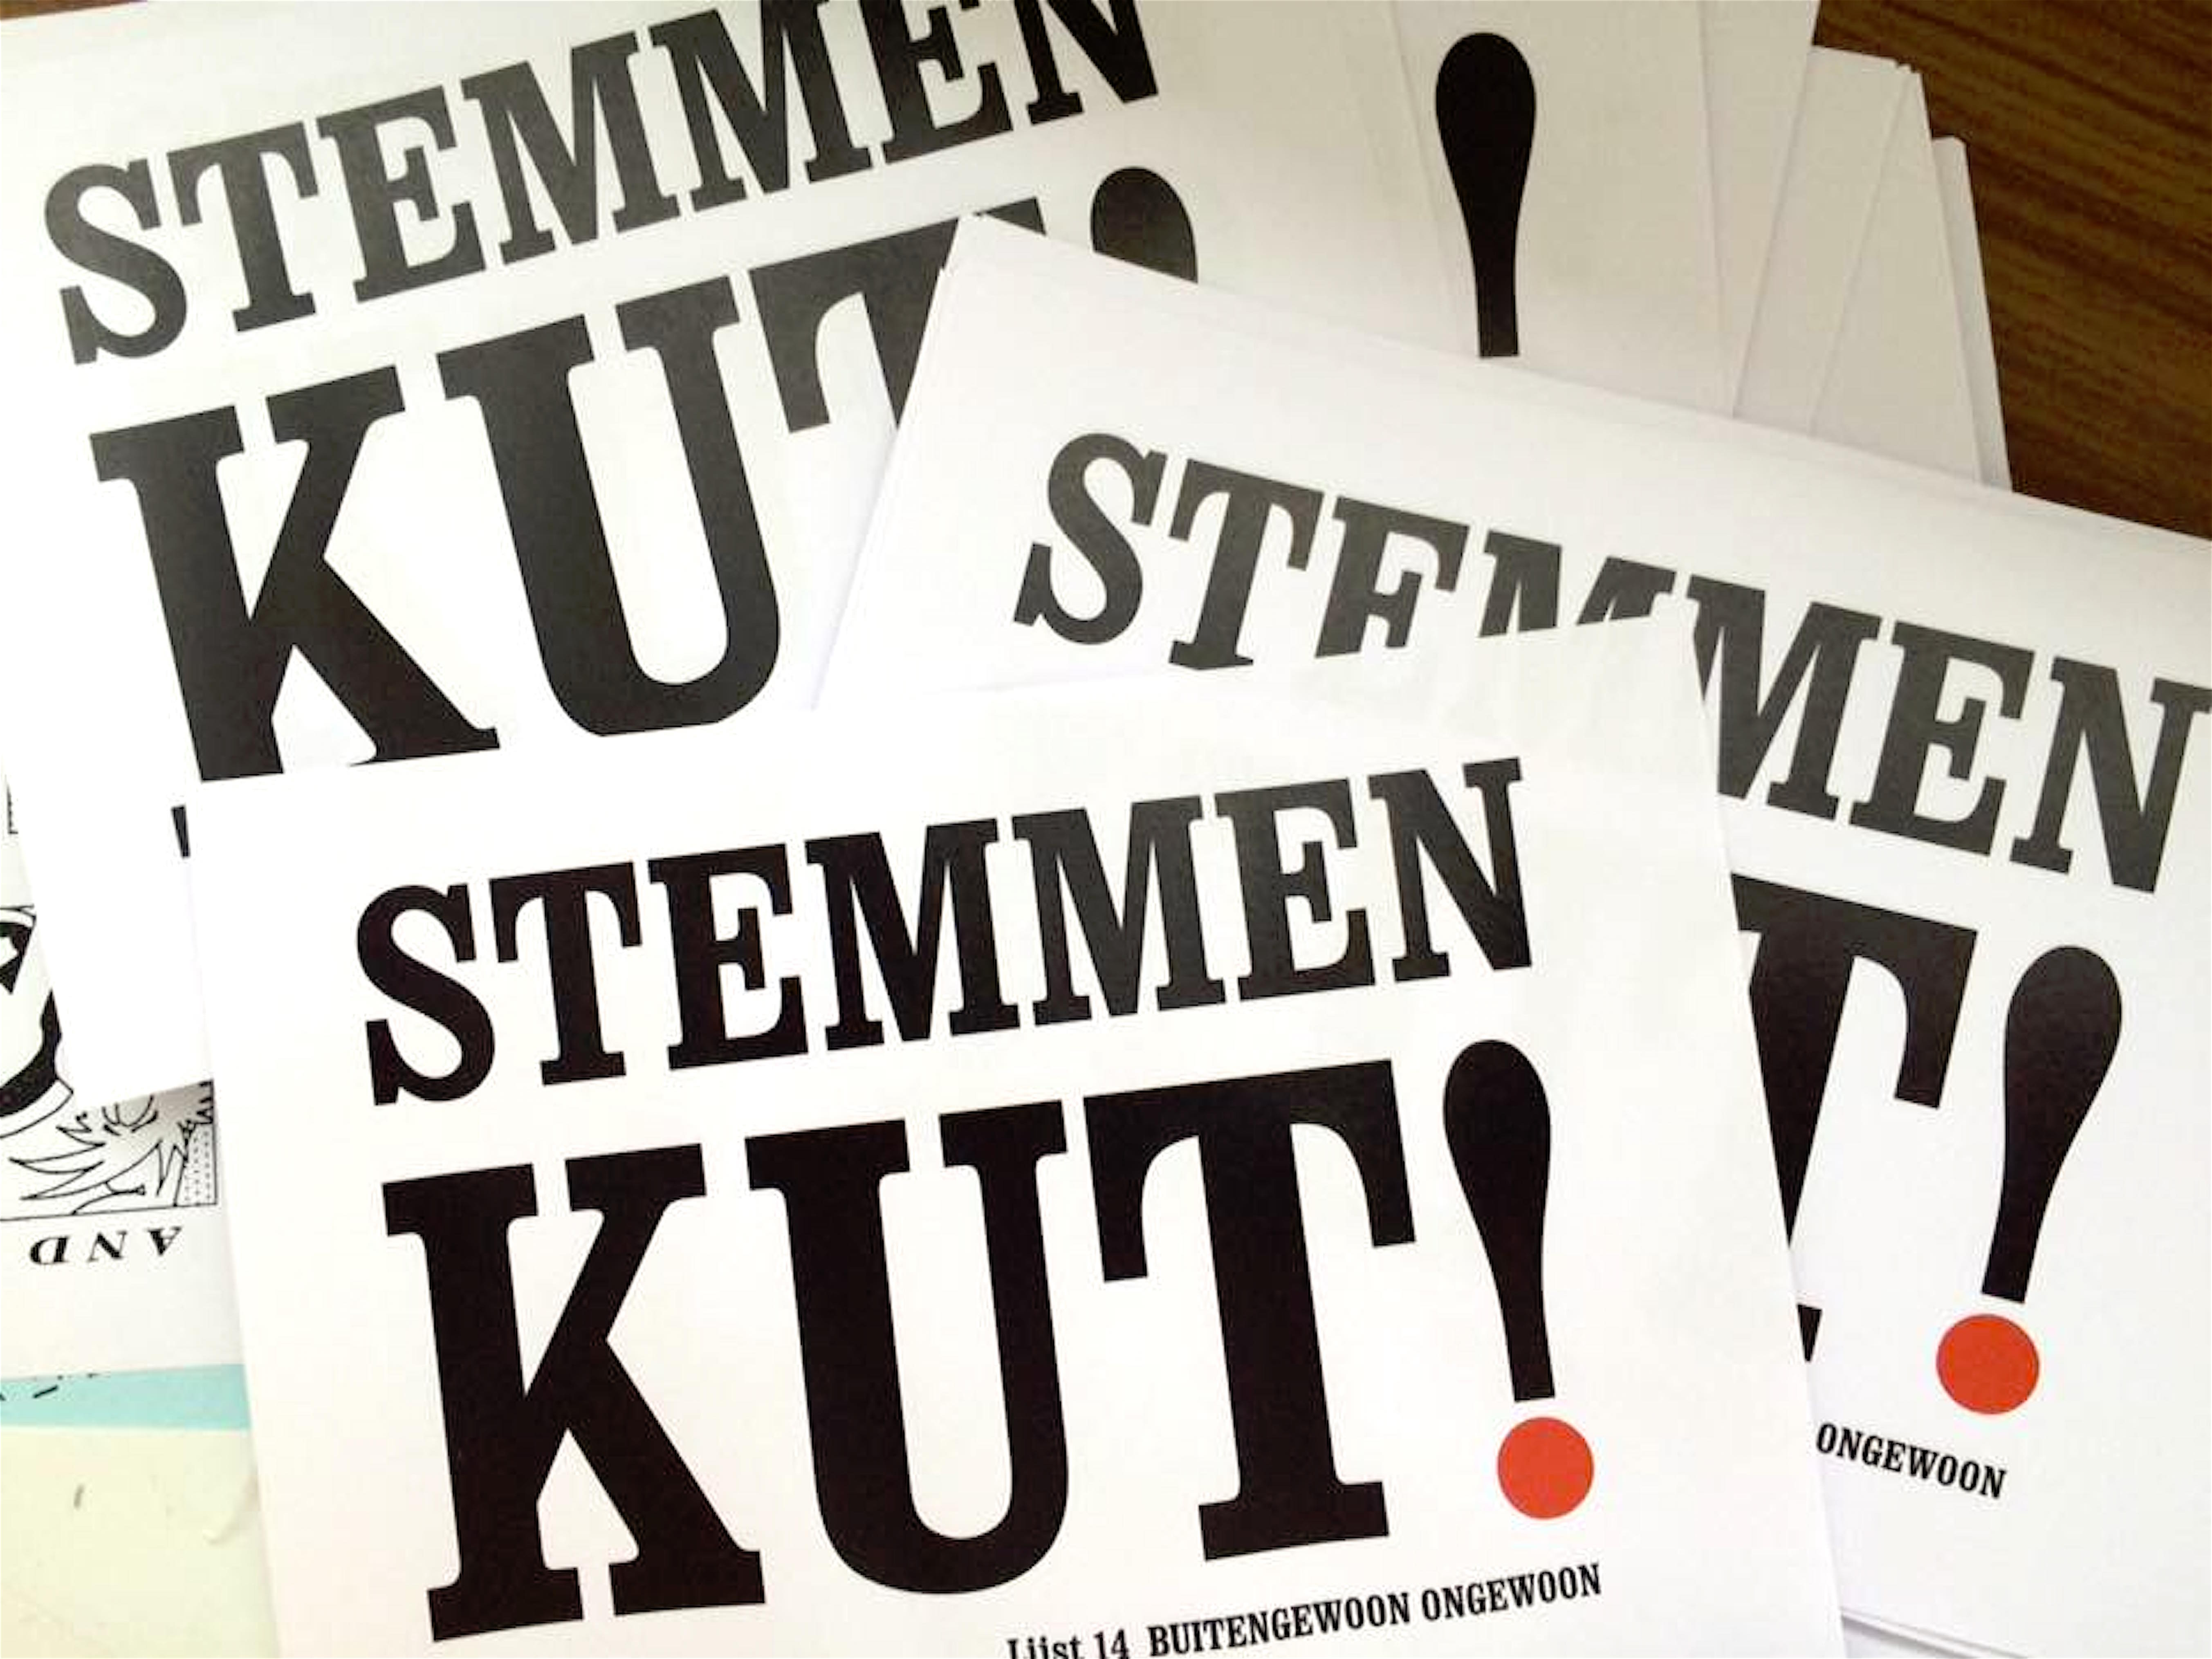 Lijst 14 Buitengewoon Ongewoon: Stemmen KUT! (foto Facebook)